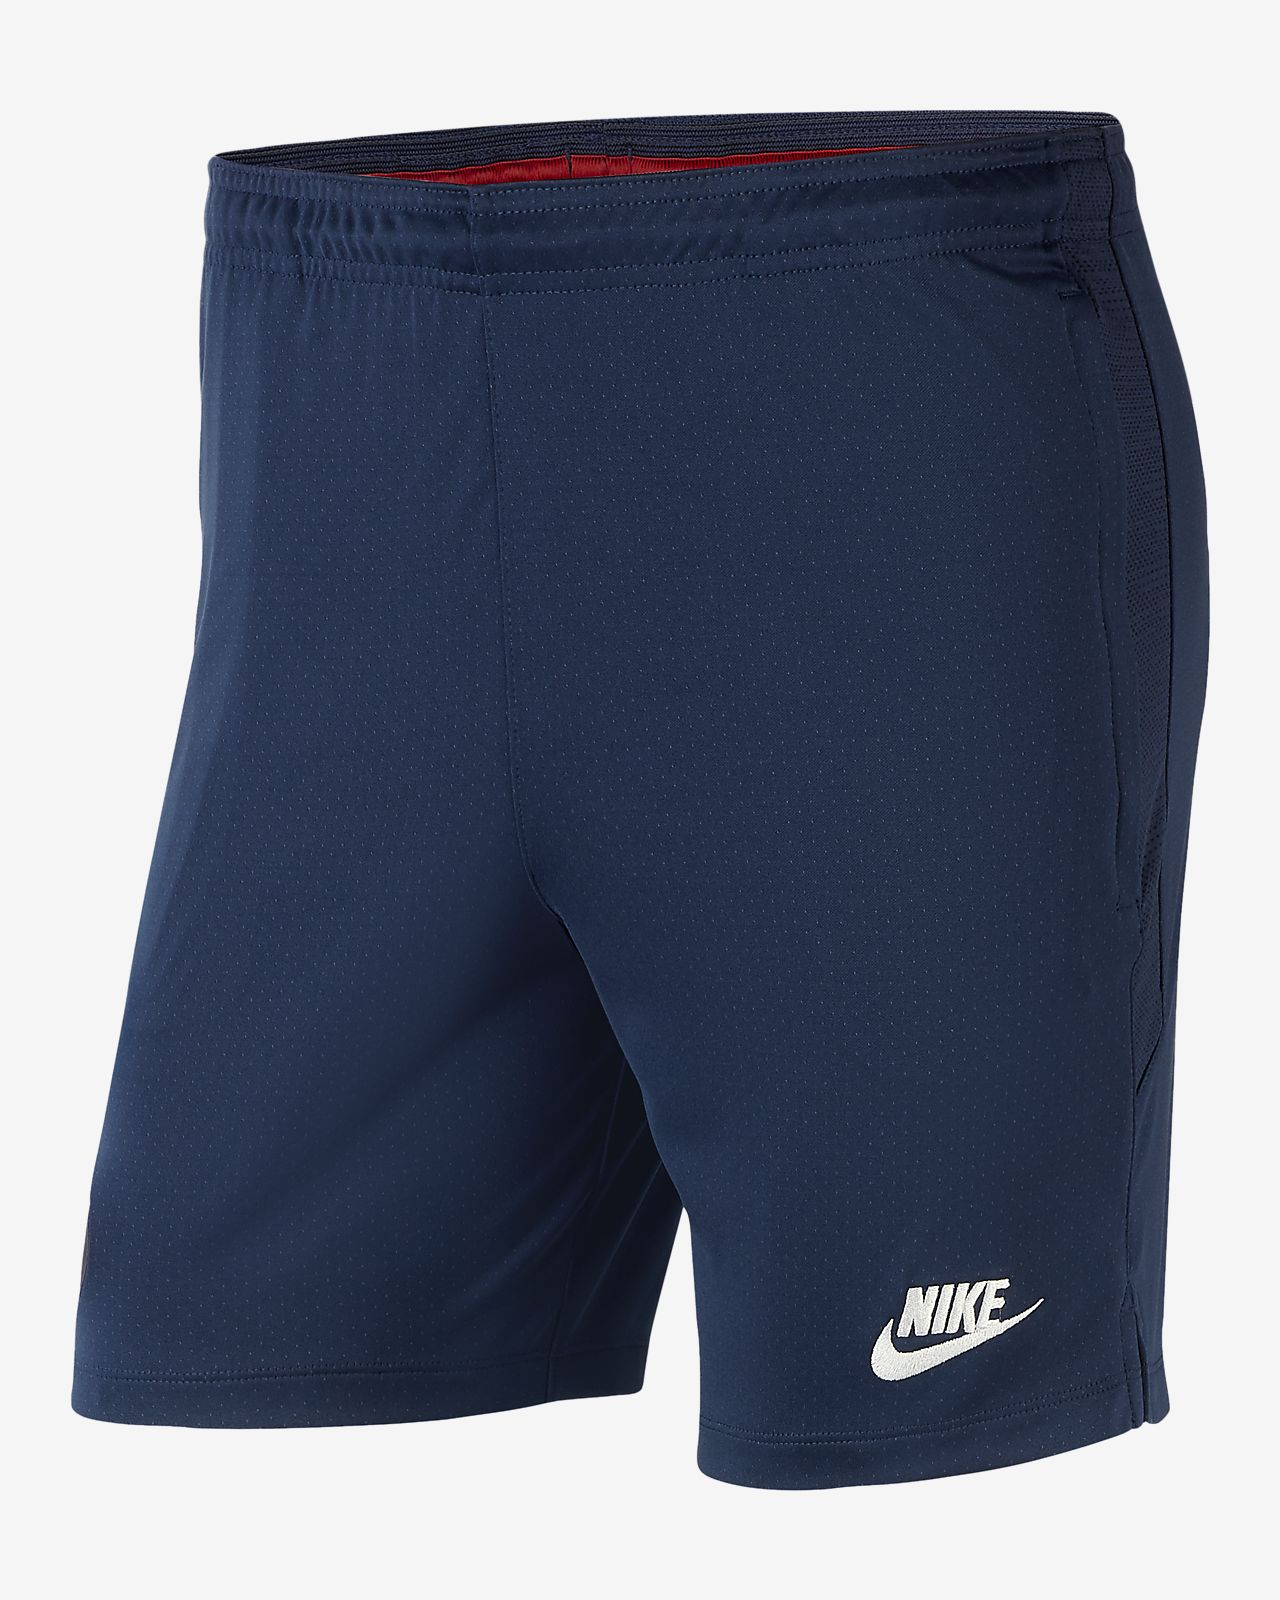 Nike Dri-FIT Paris Saint-Germain Strike Men's Football Shorts